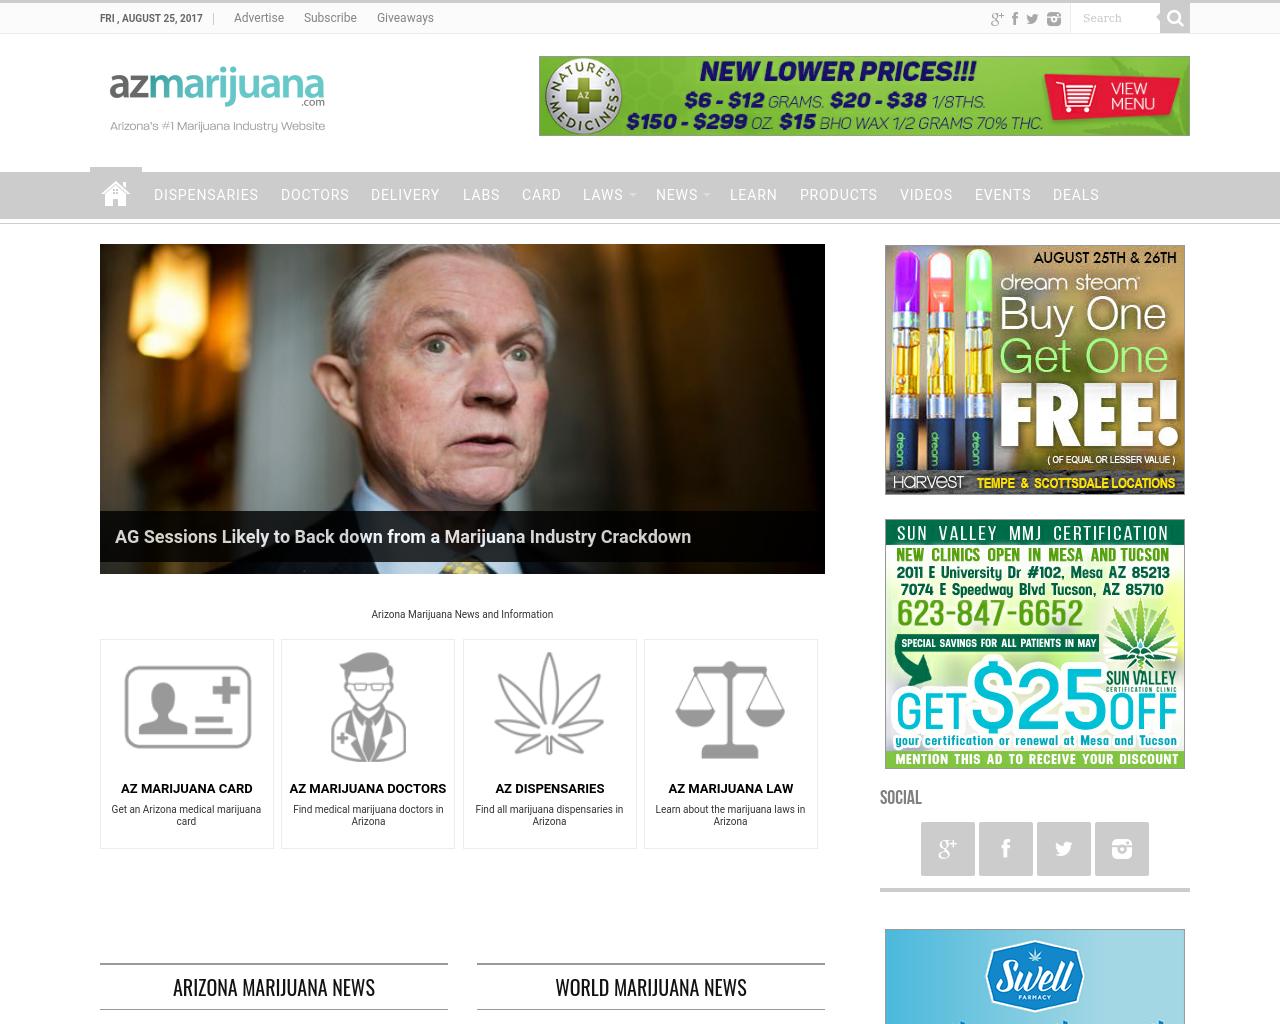 AZ-Marijuana-Advertising-Reviews-Pricing